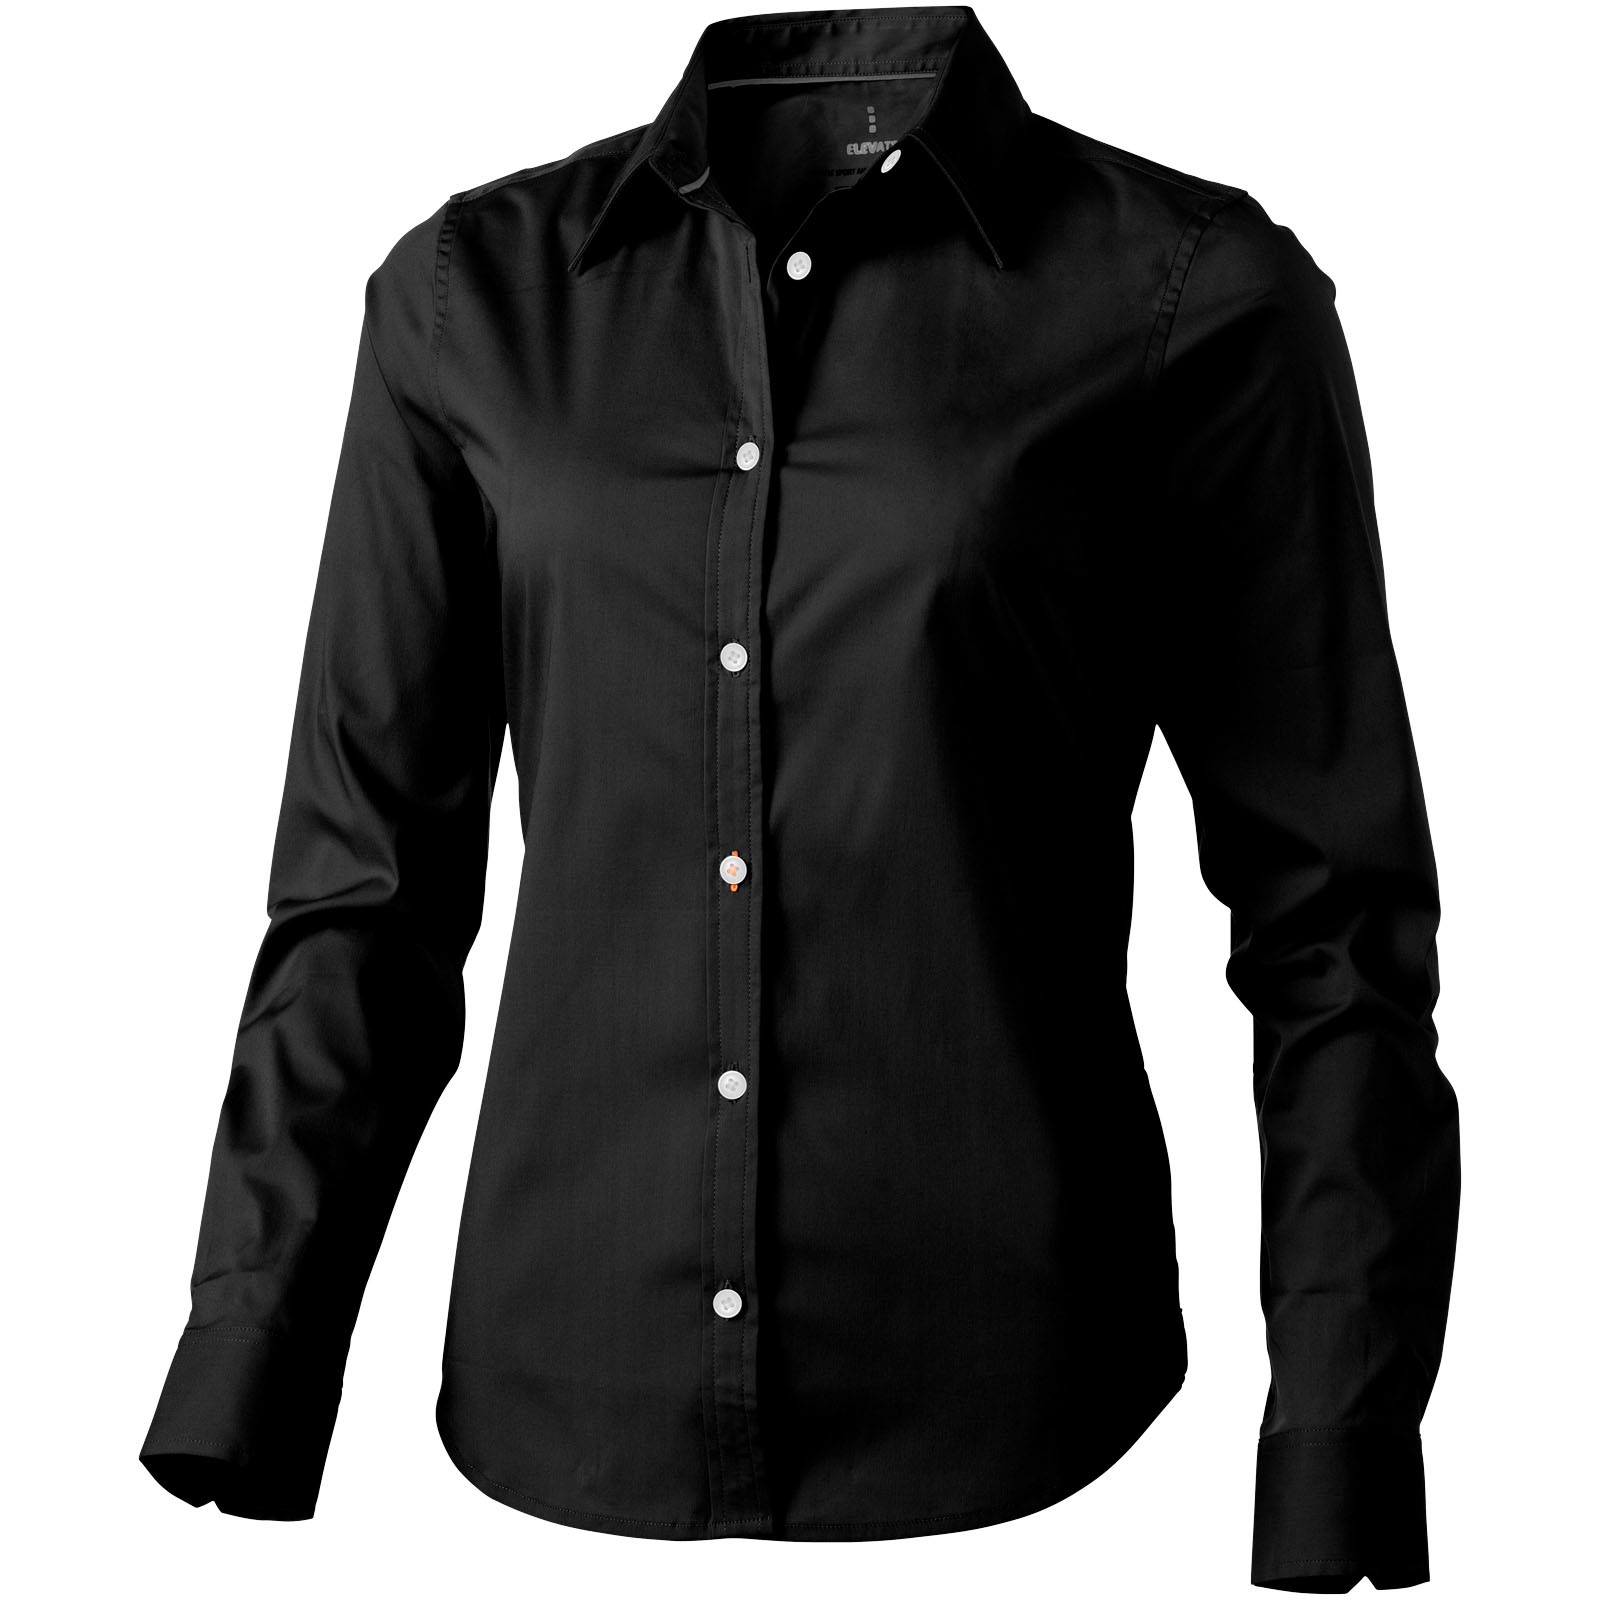 Hamilton long sleeve women's shirt - Solid black / S